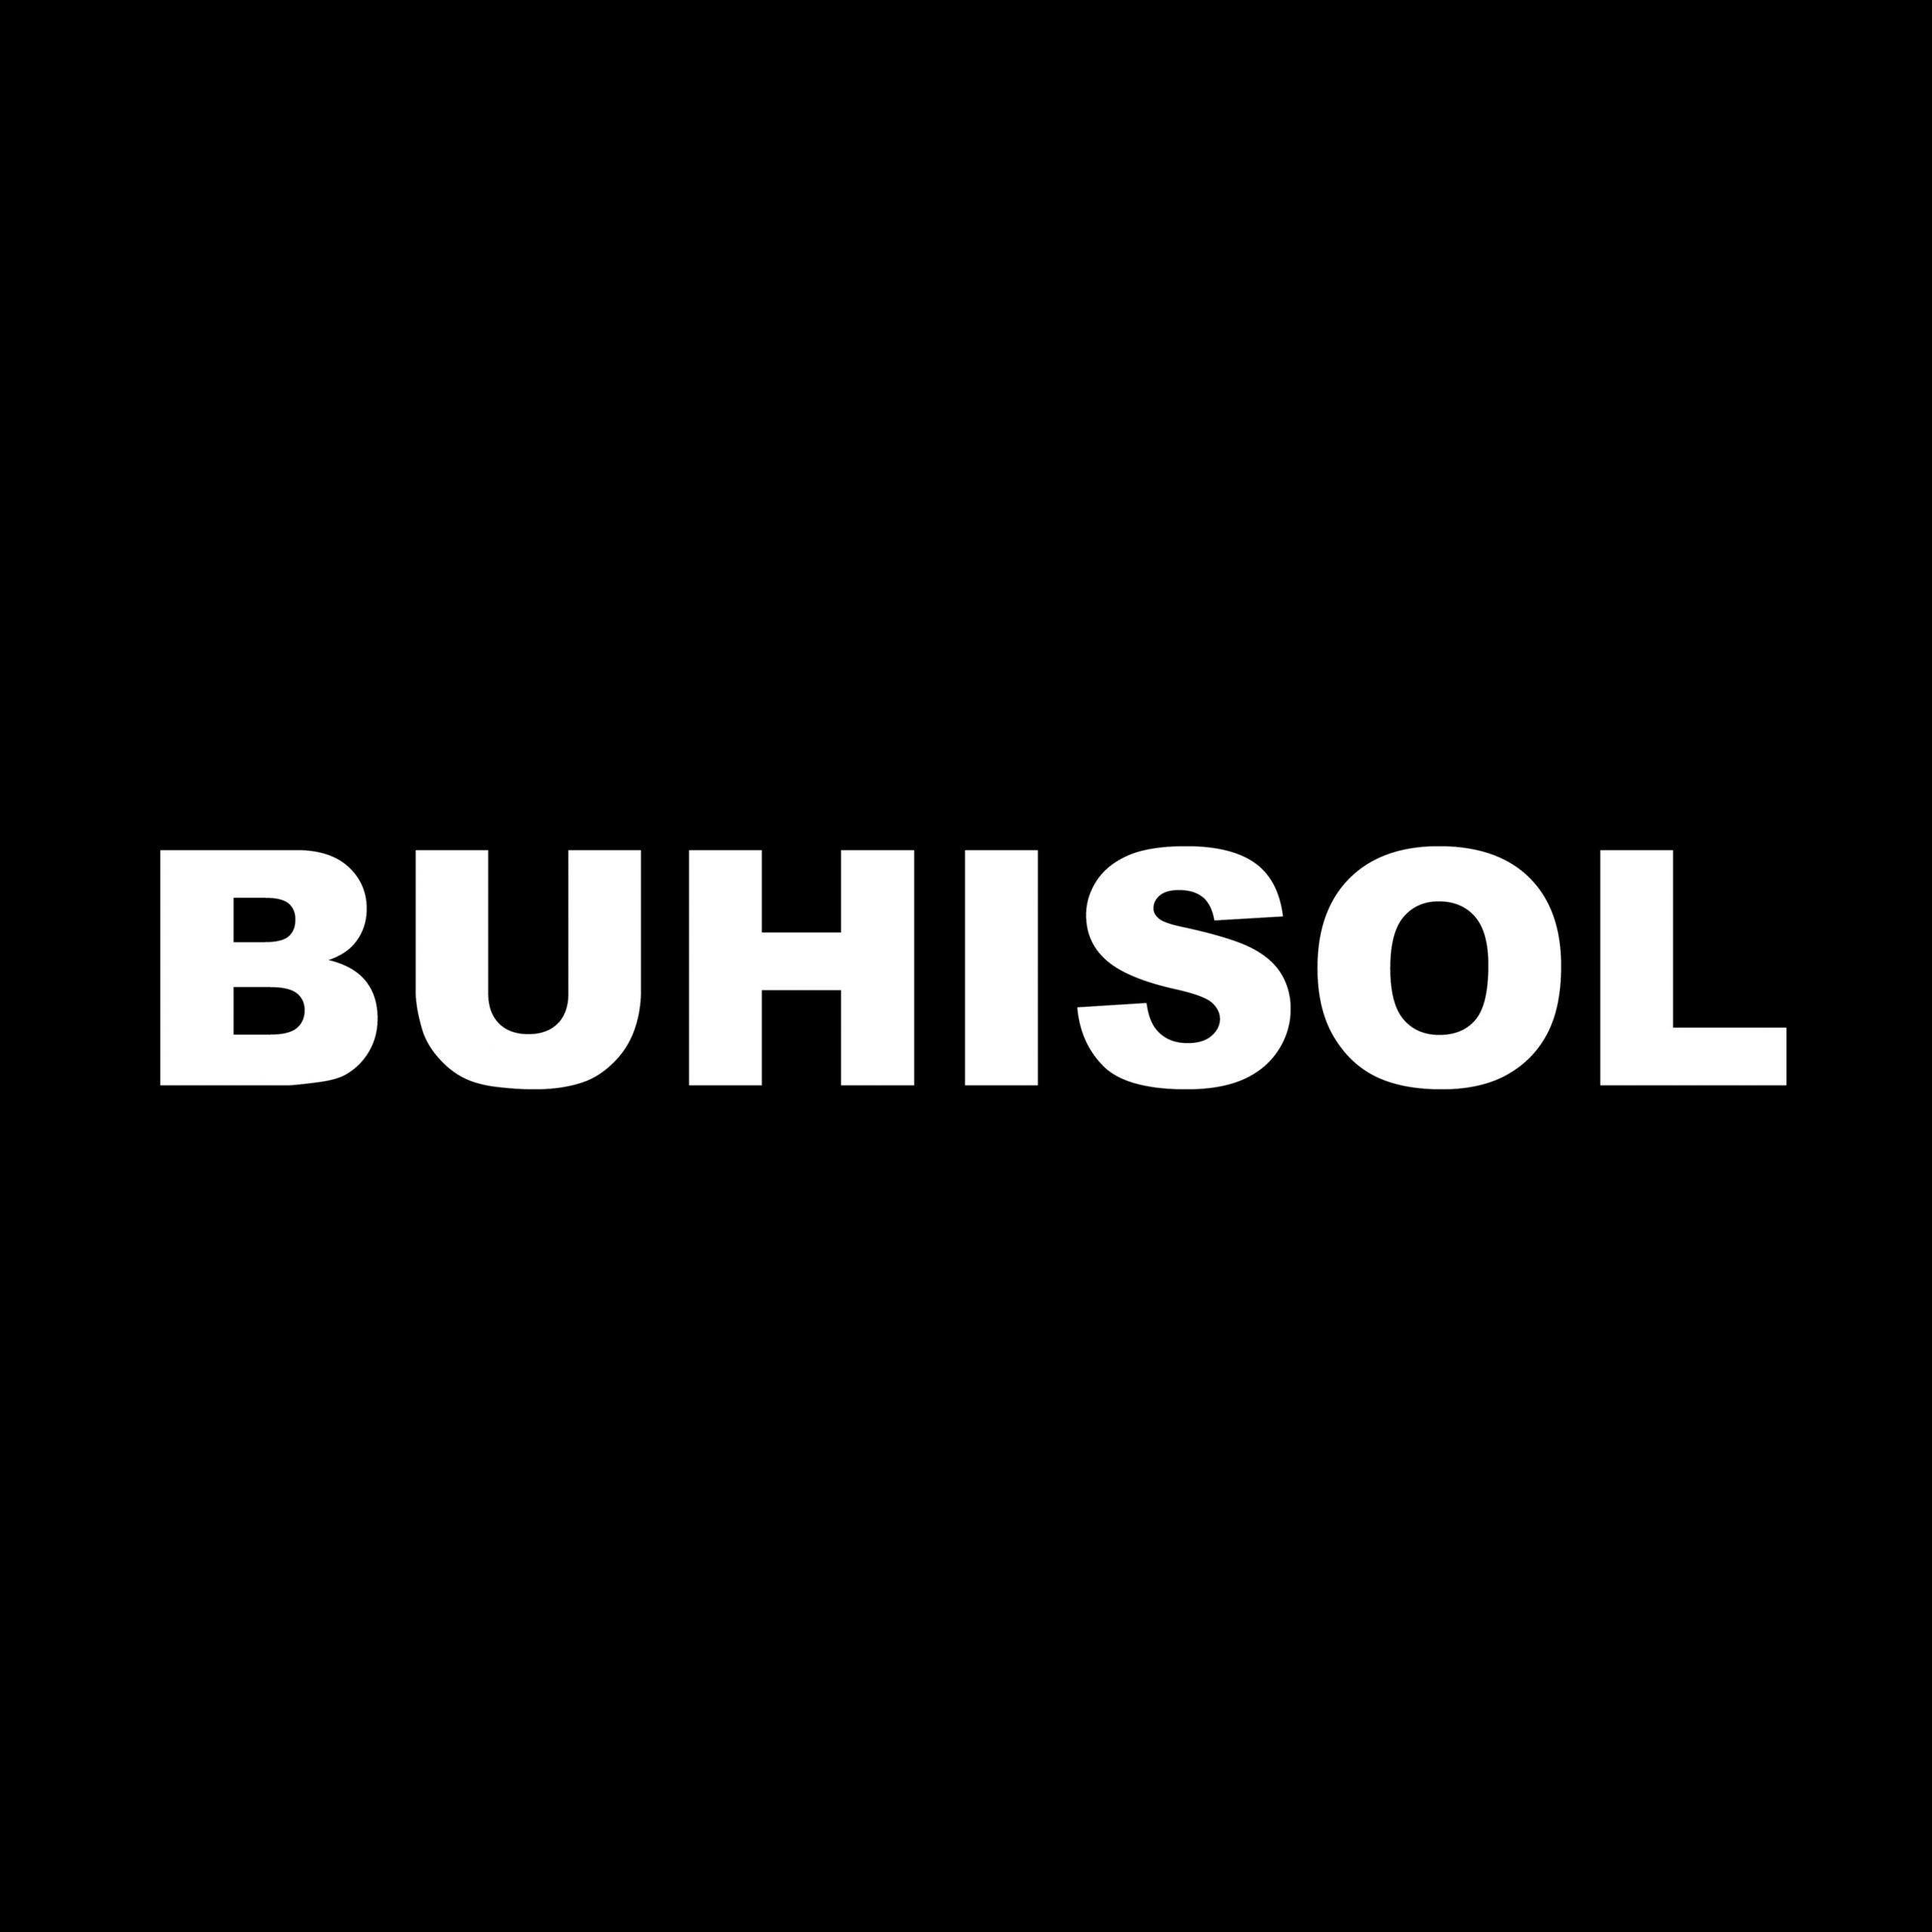 BUHISOL